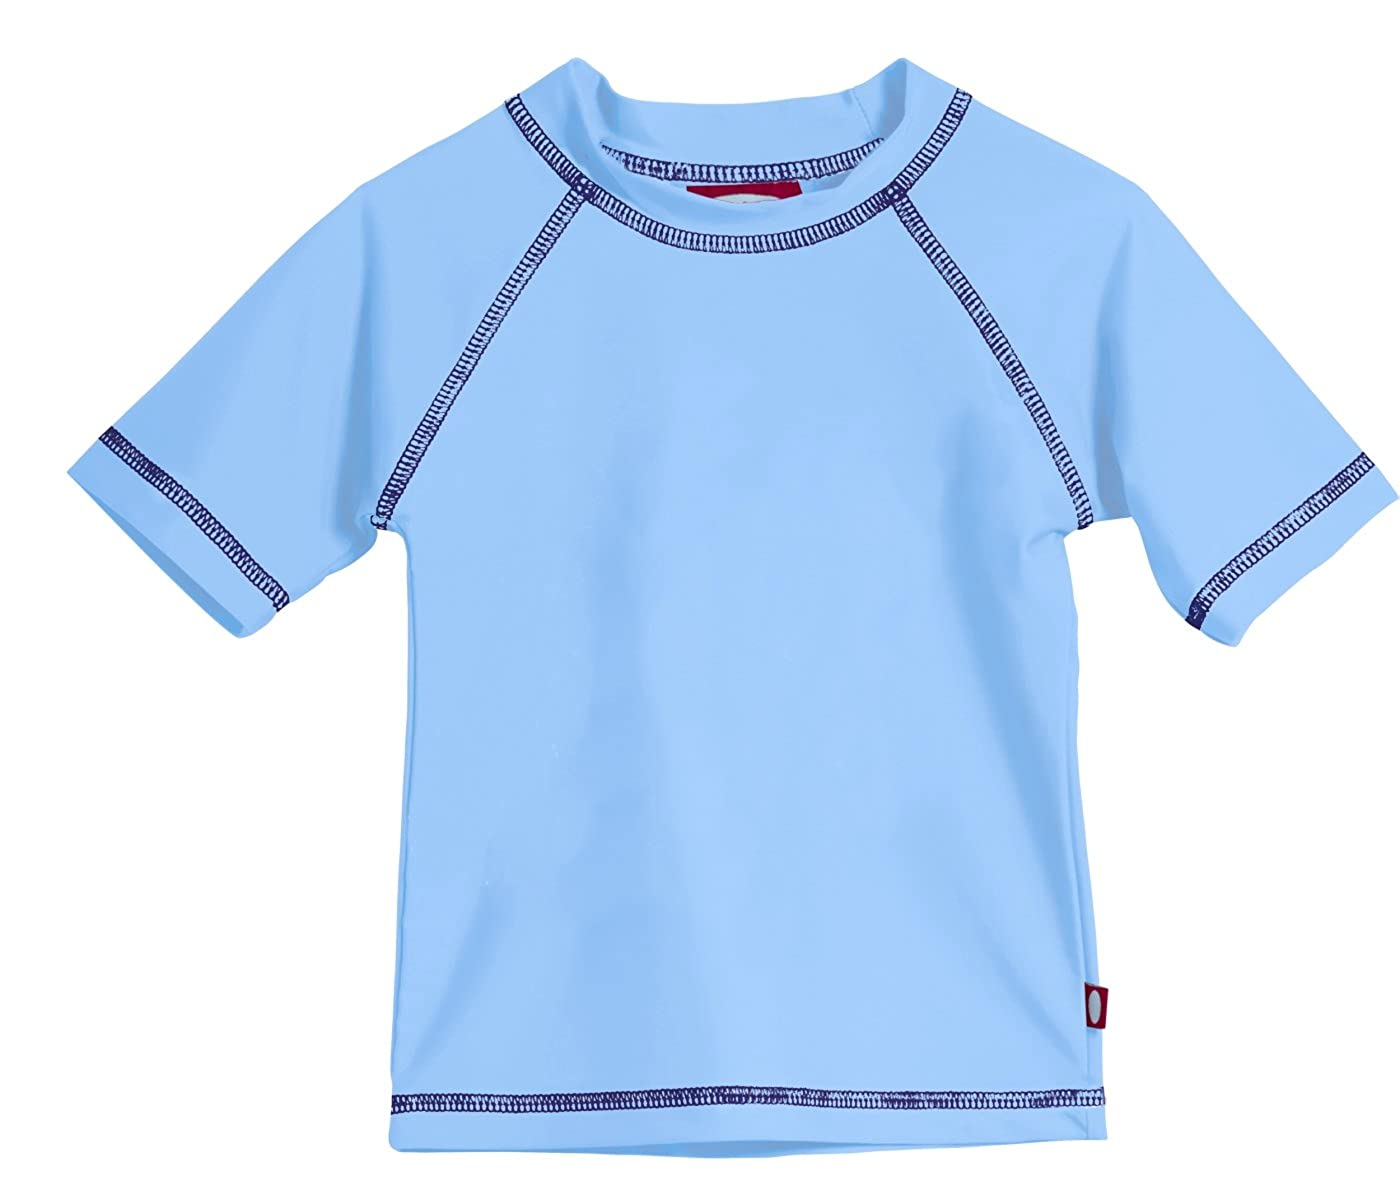 City Threads Little Boys /& Girls Rash Guard Swimming Tee SPF50 Protection 2T-6